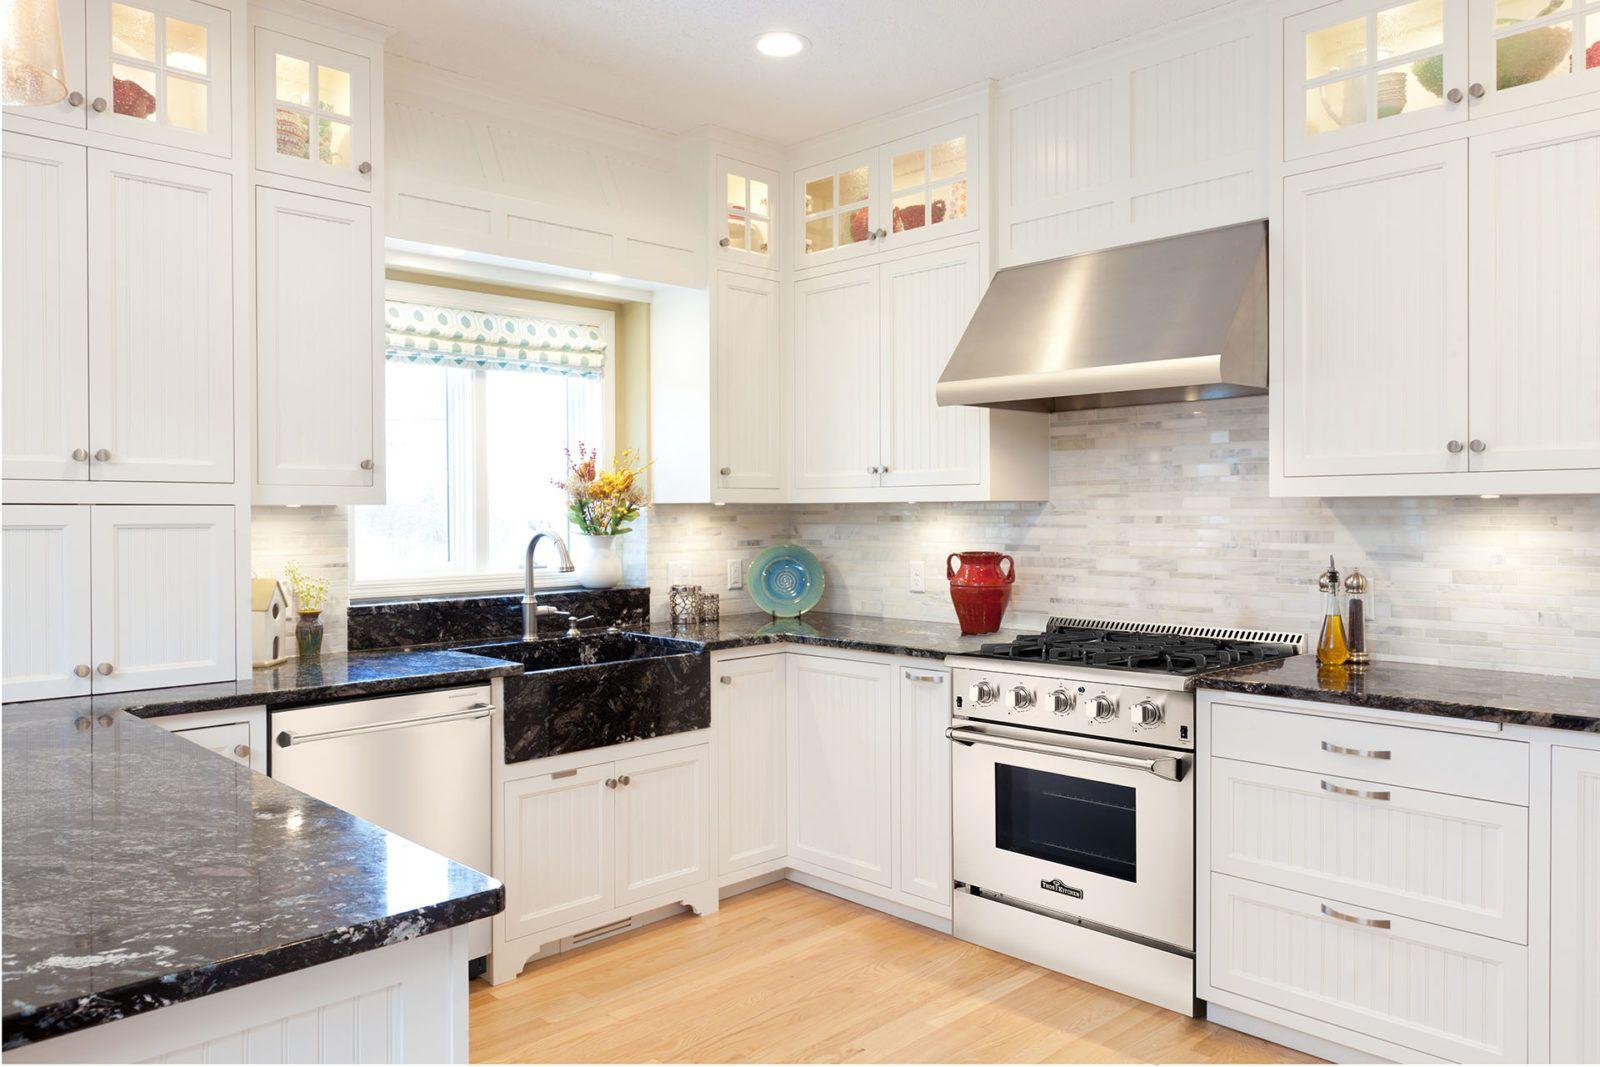 Thor Kitchen Professional Kitchen Appliances Range Hood Kitchen Remodel Small Kitchen Suite